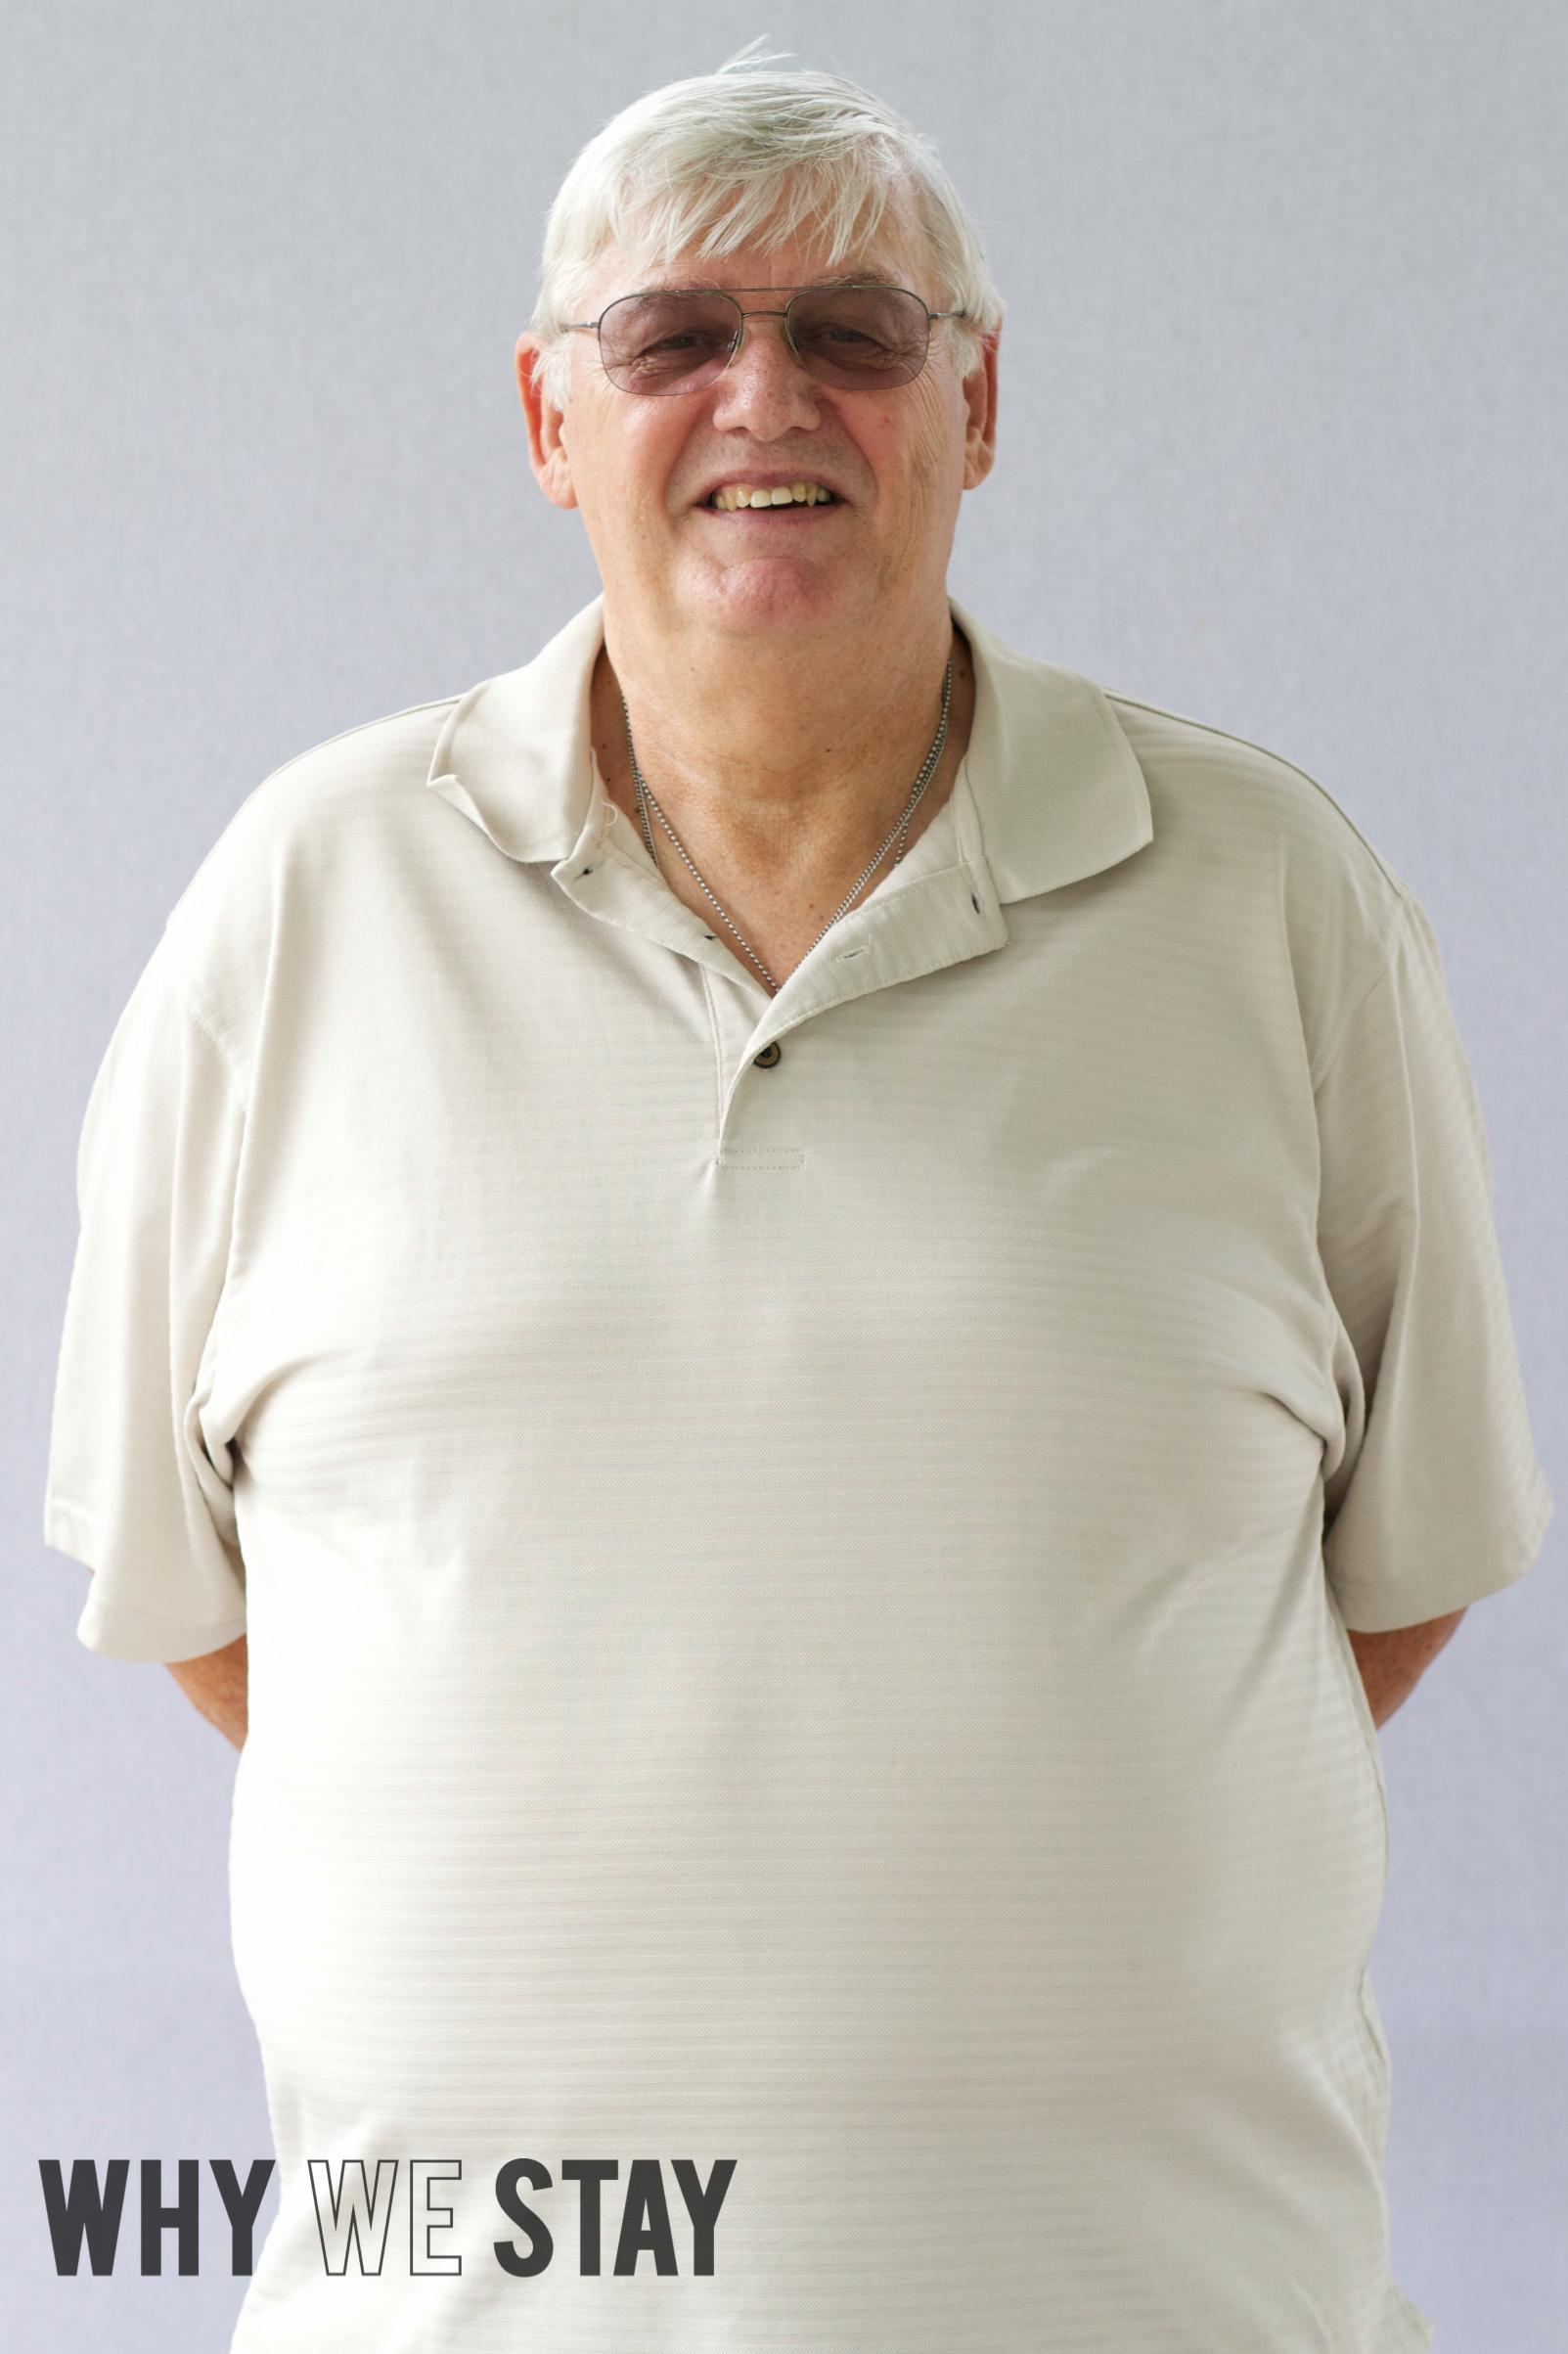 Bill Ballou